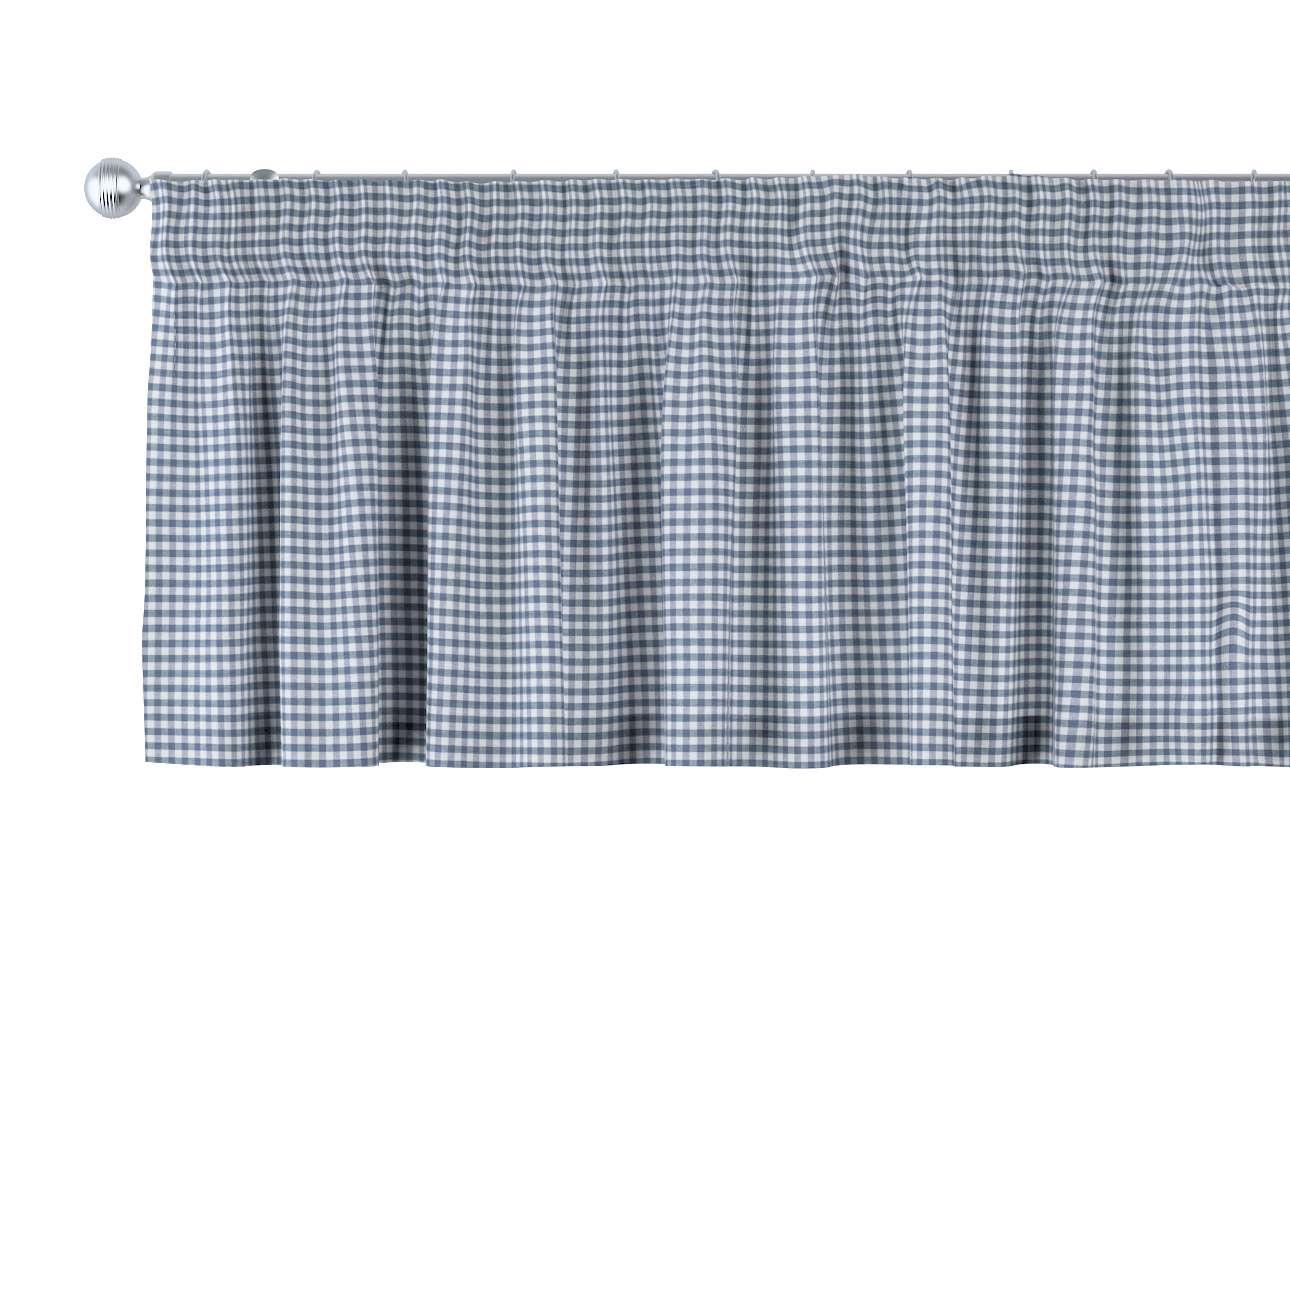 Lambrekin na řasící pásce 130 × 40 cm v kolekci Quadro, látka: 136-00